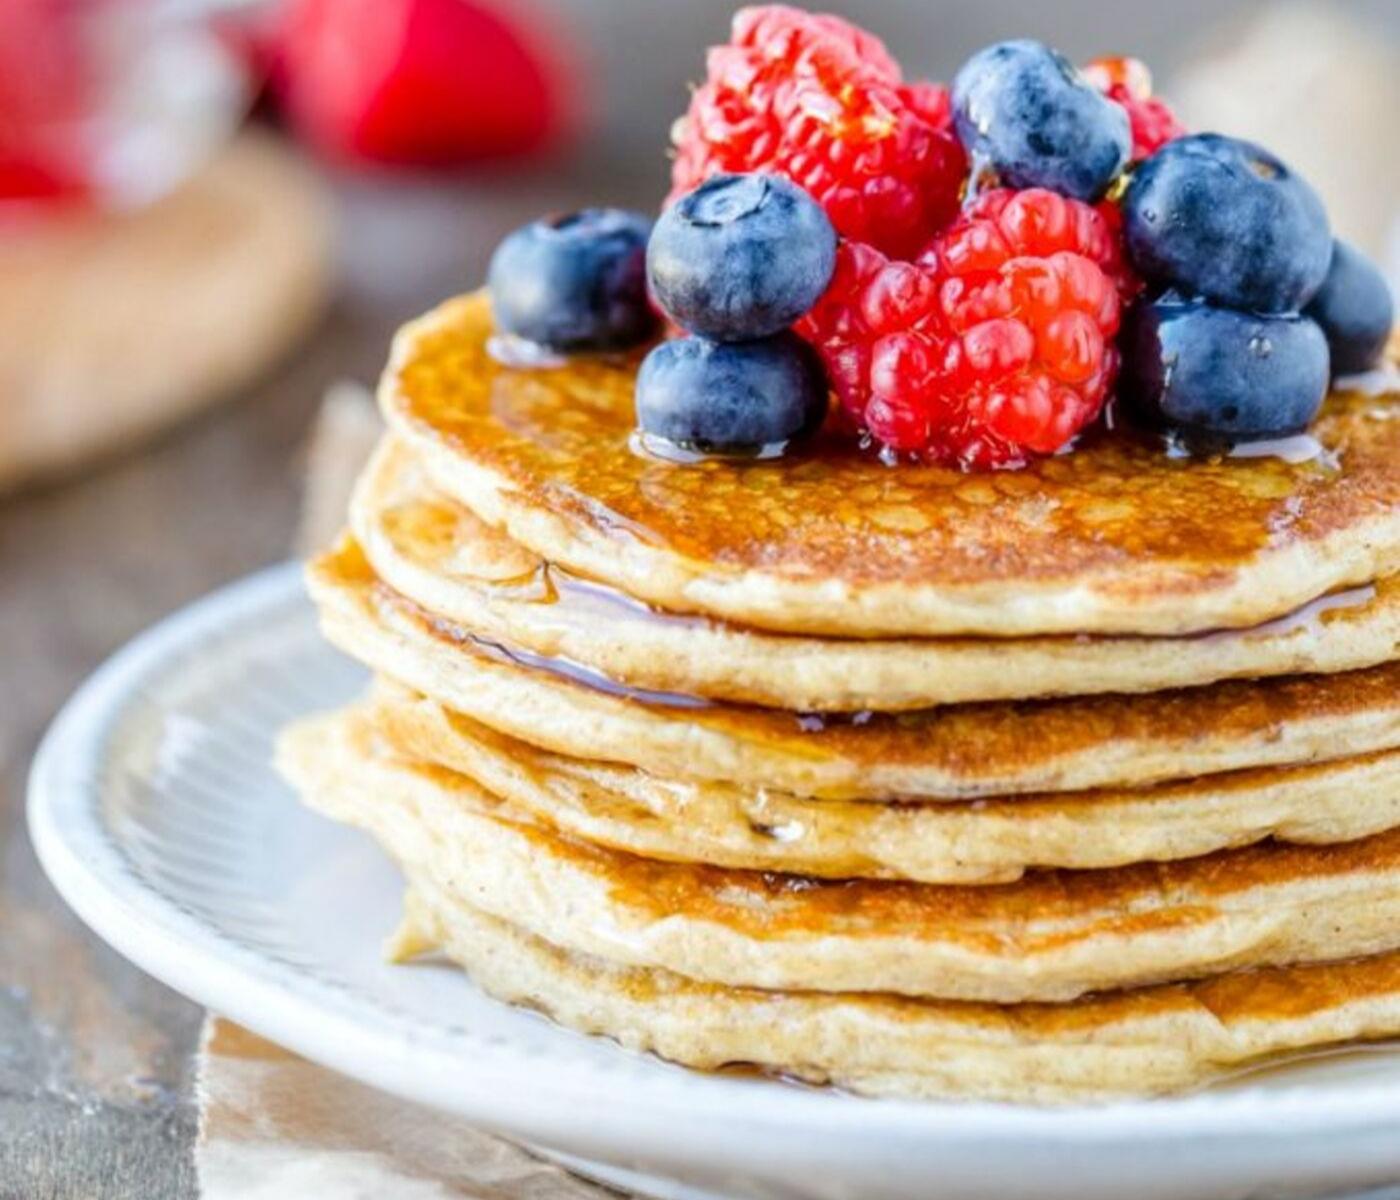 Mayo bed & breakfast